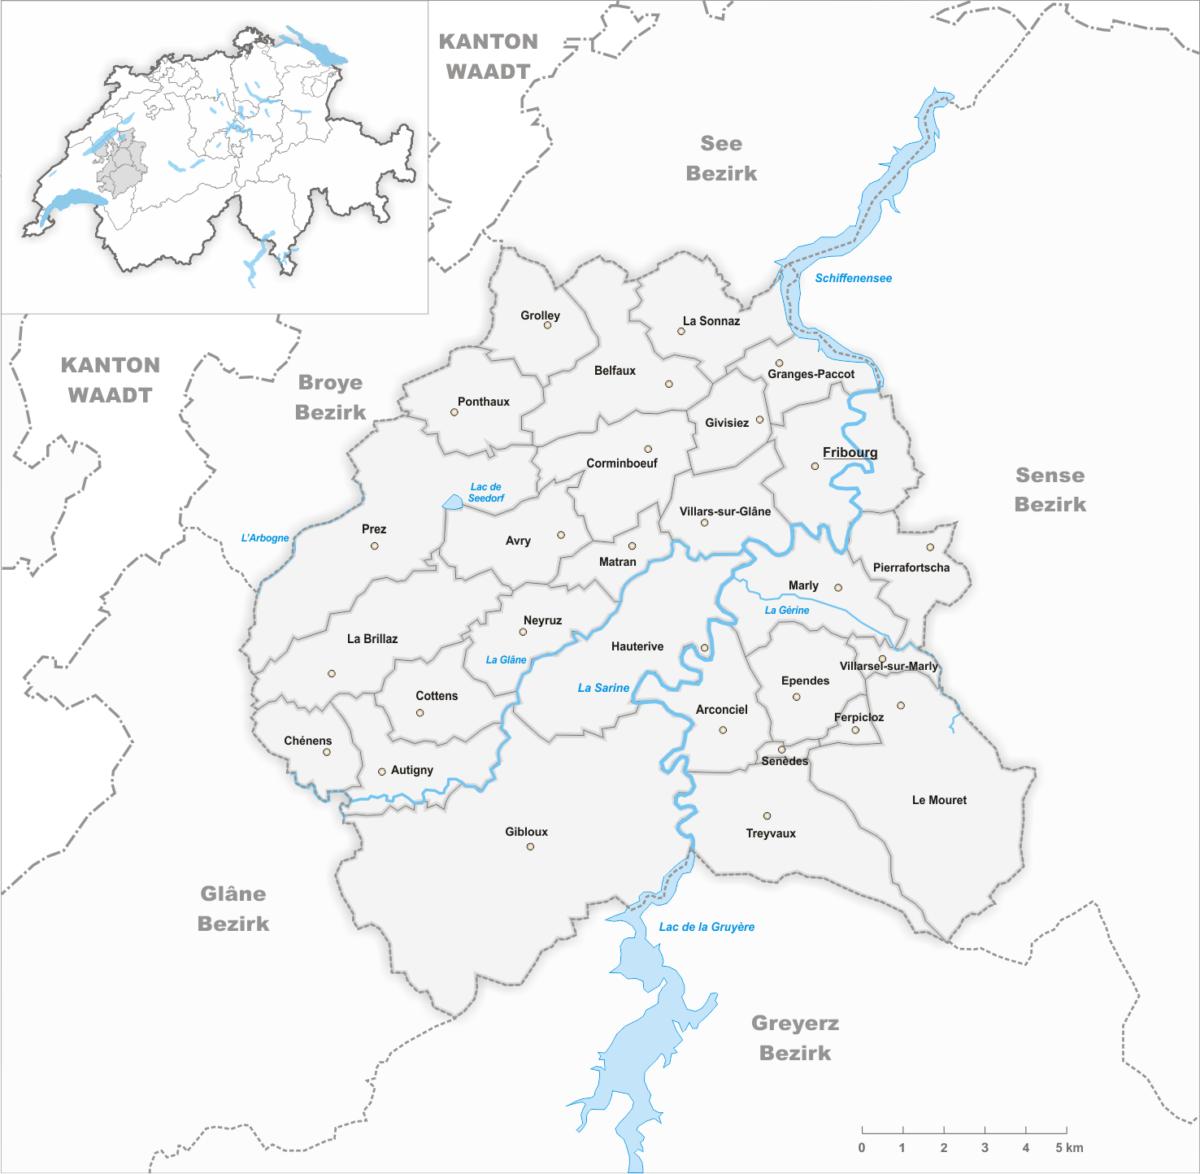 La carte du district de la Sarine.